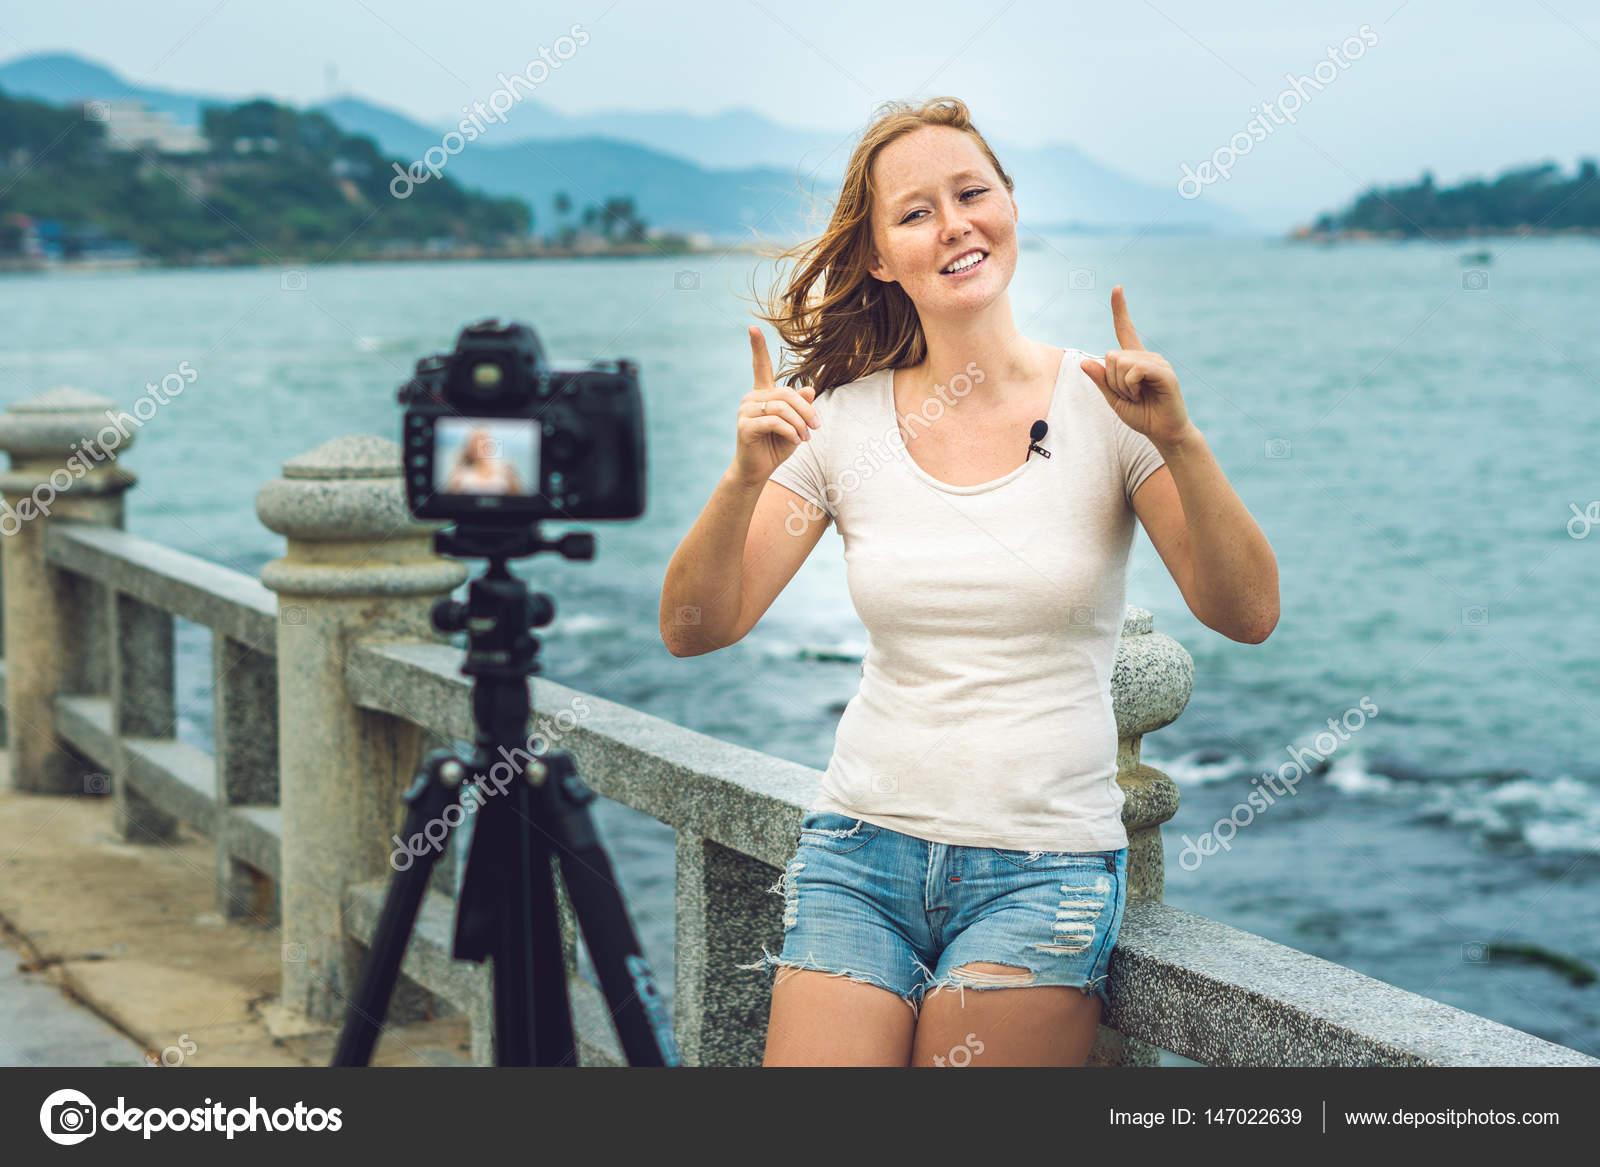 sm-video-devushka-pered-kameroy